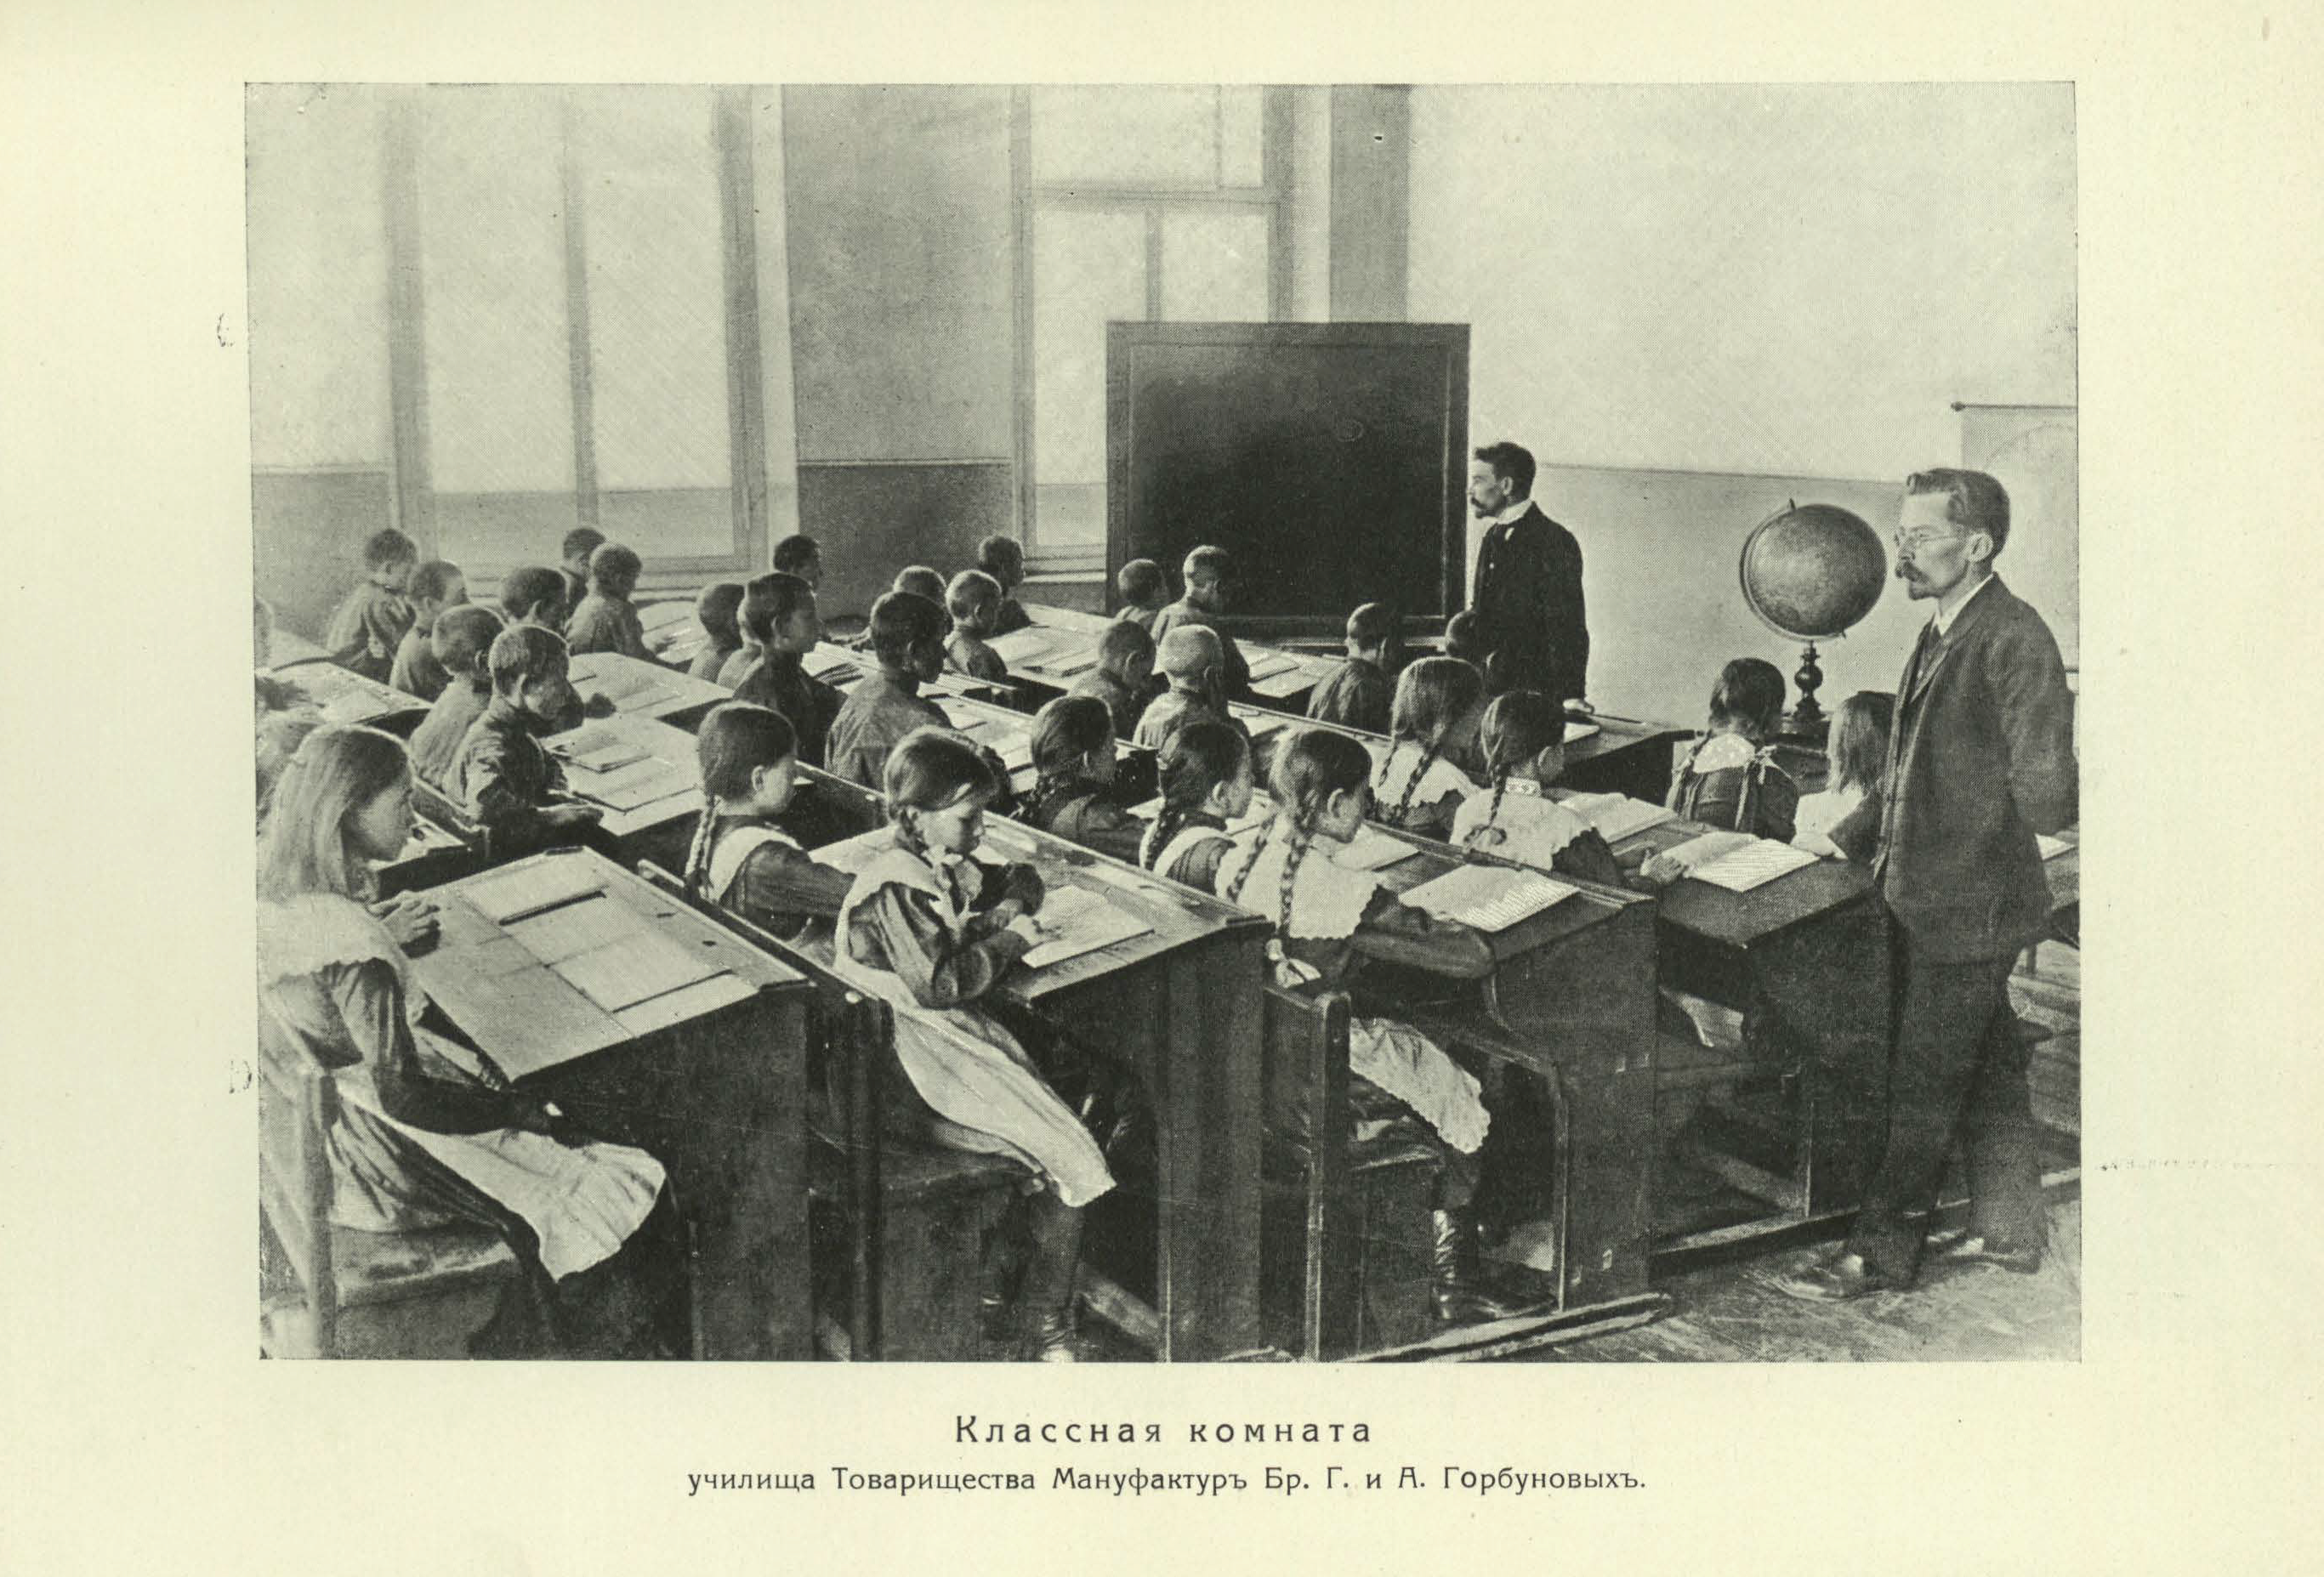 017. Классная комната училища